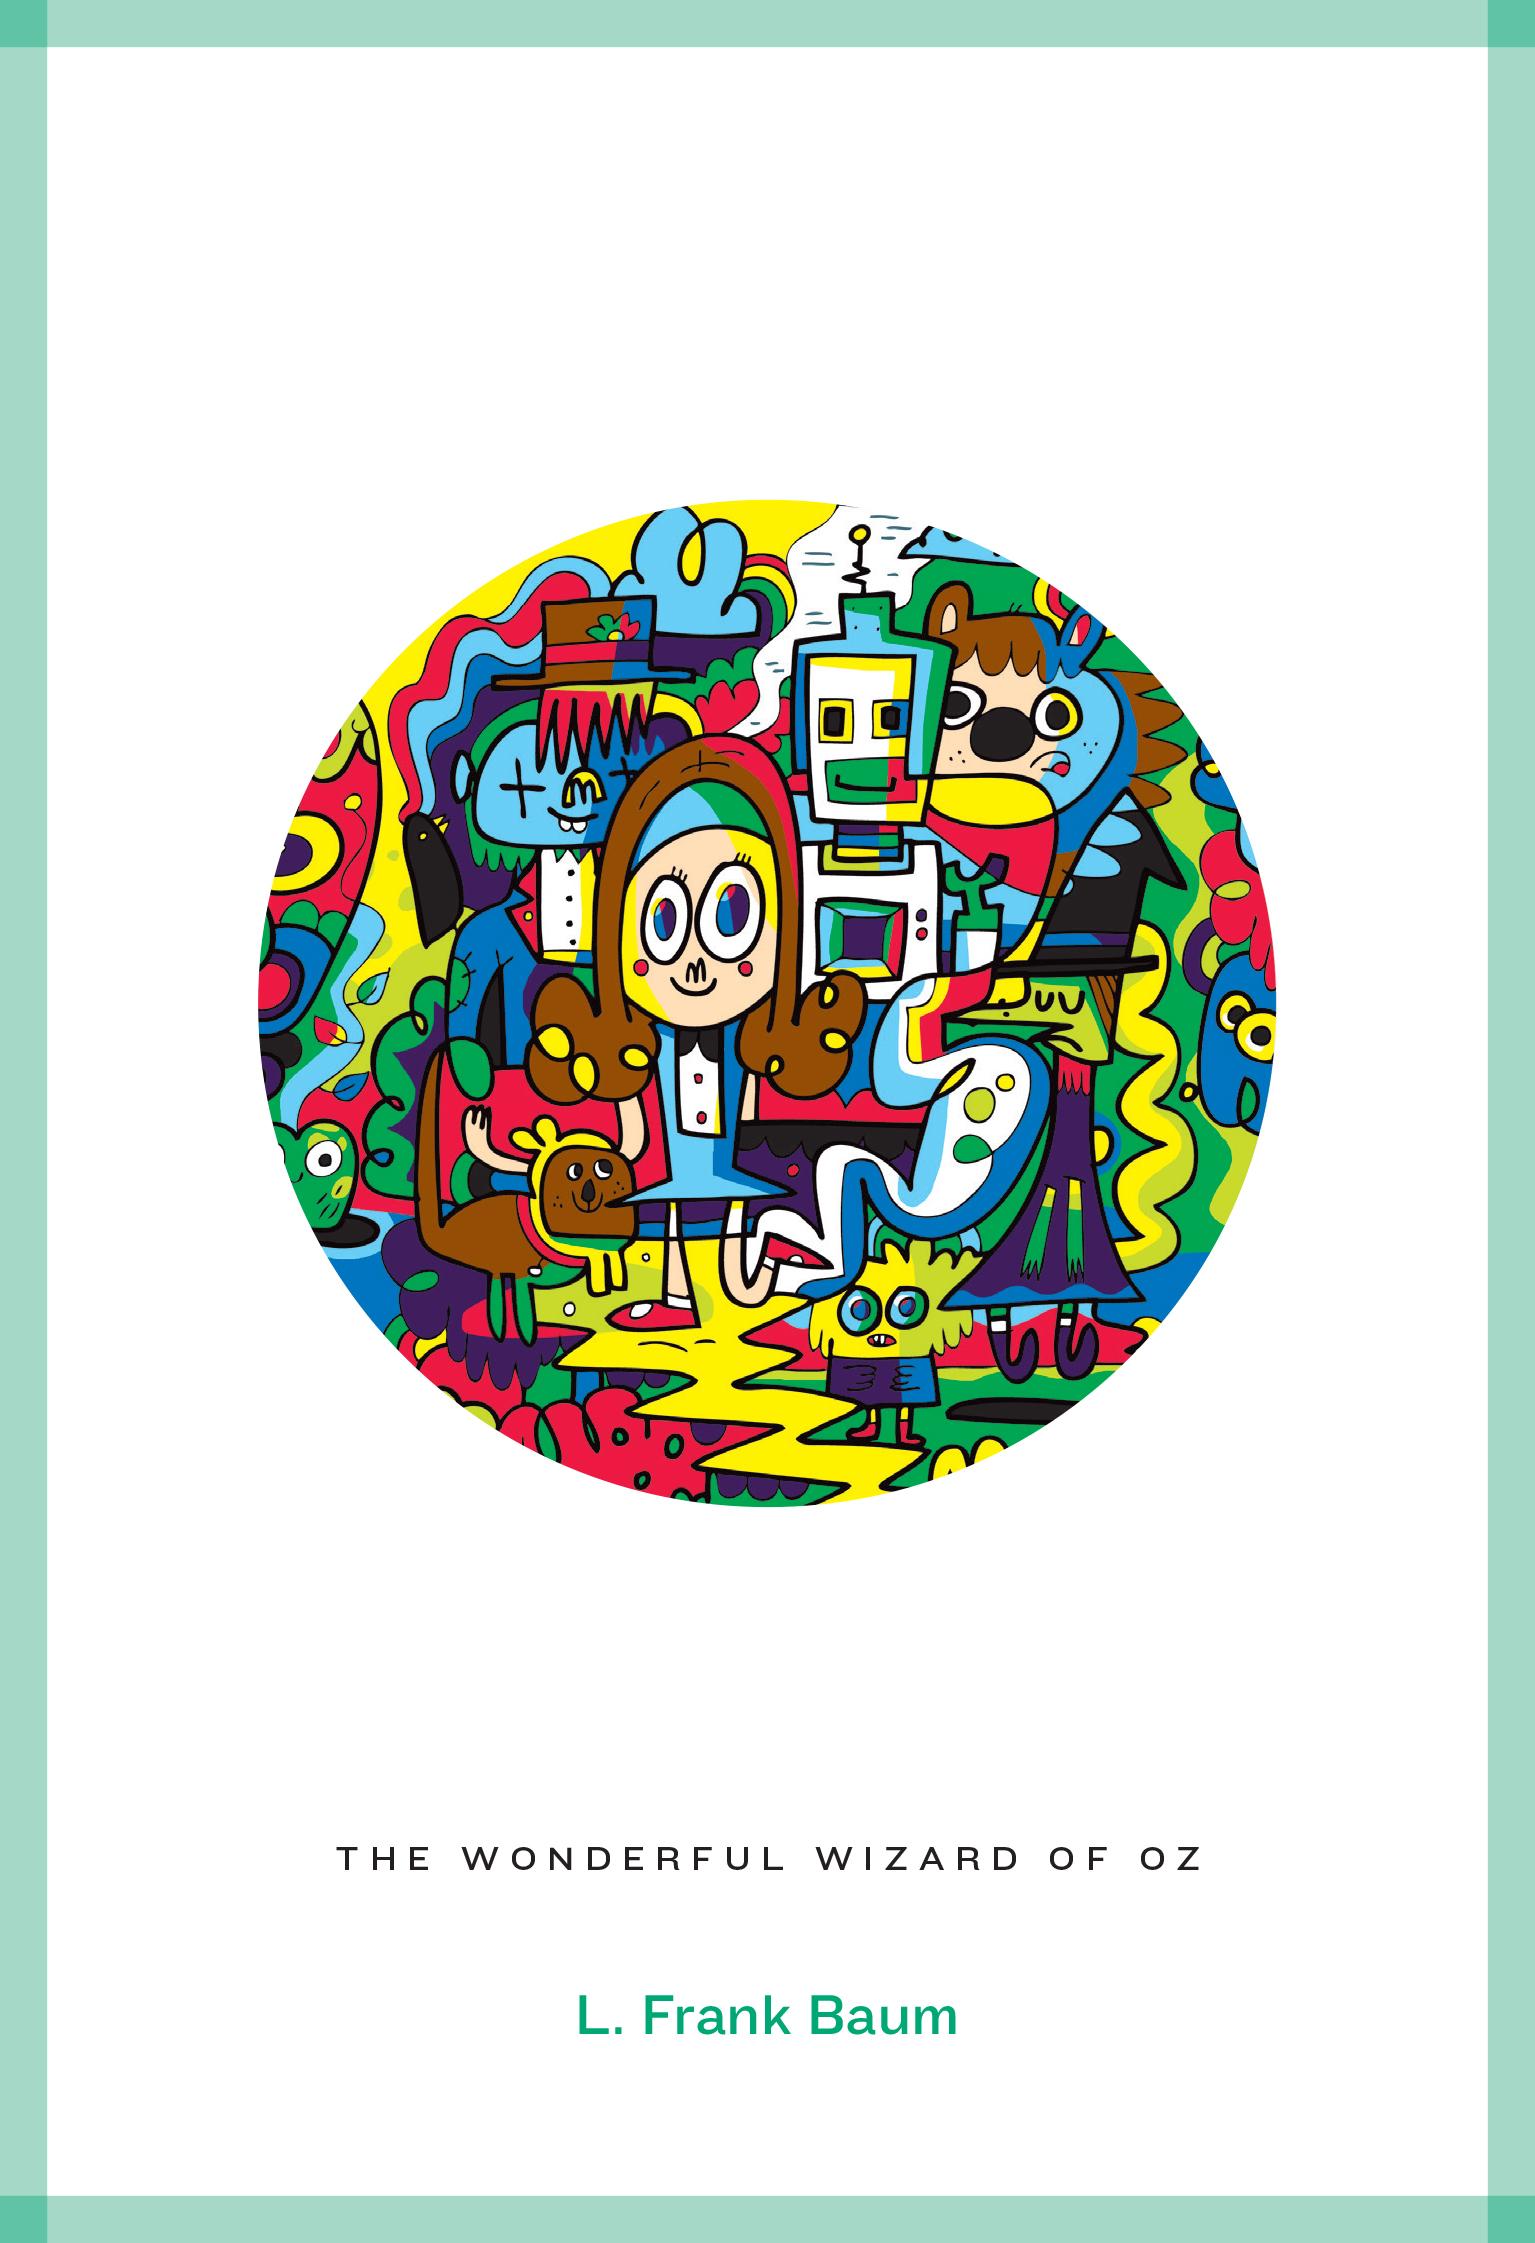 9781909399594 Wizard of Oz.jpg